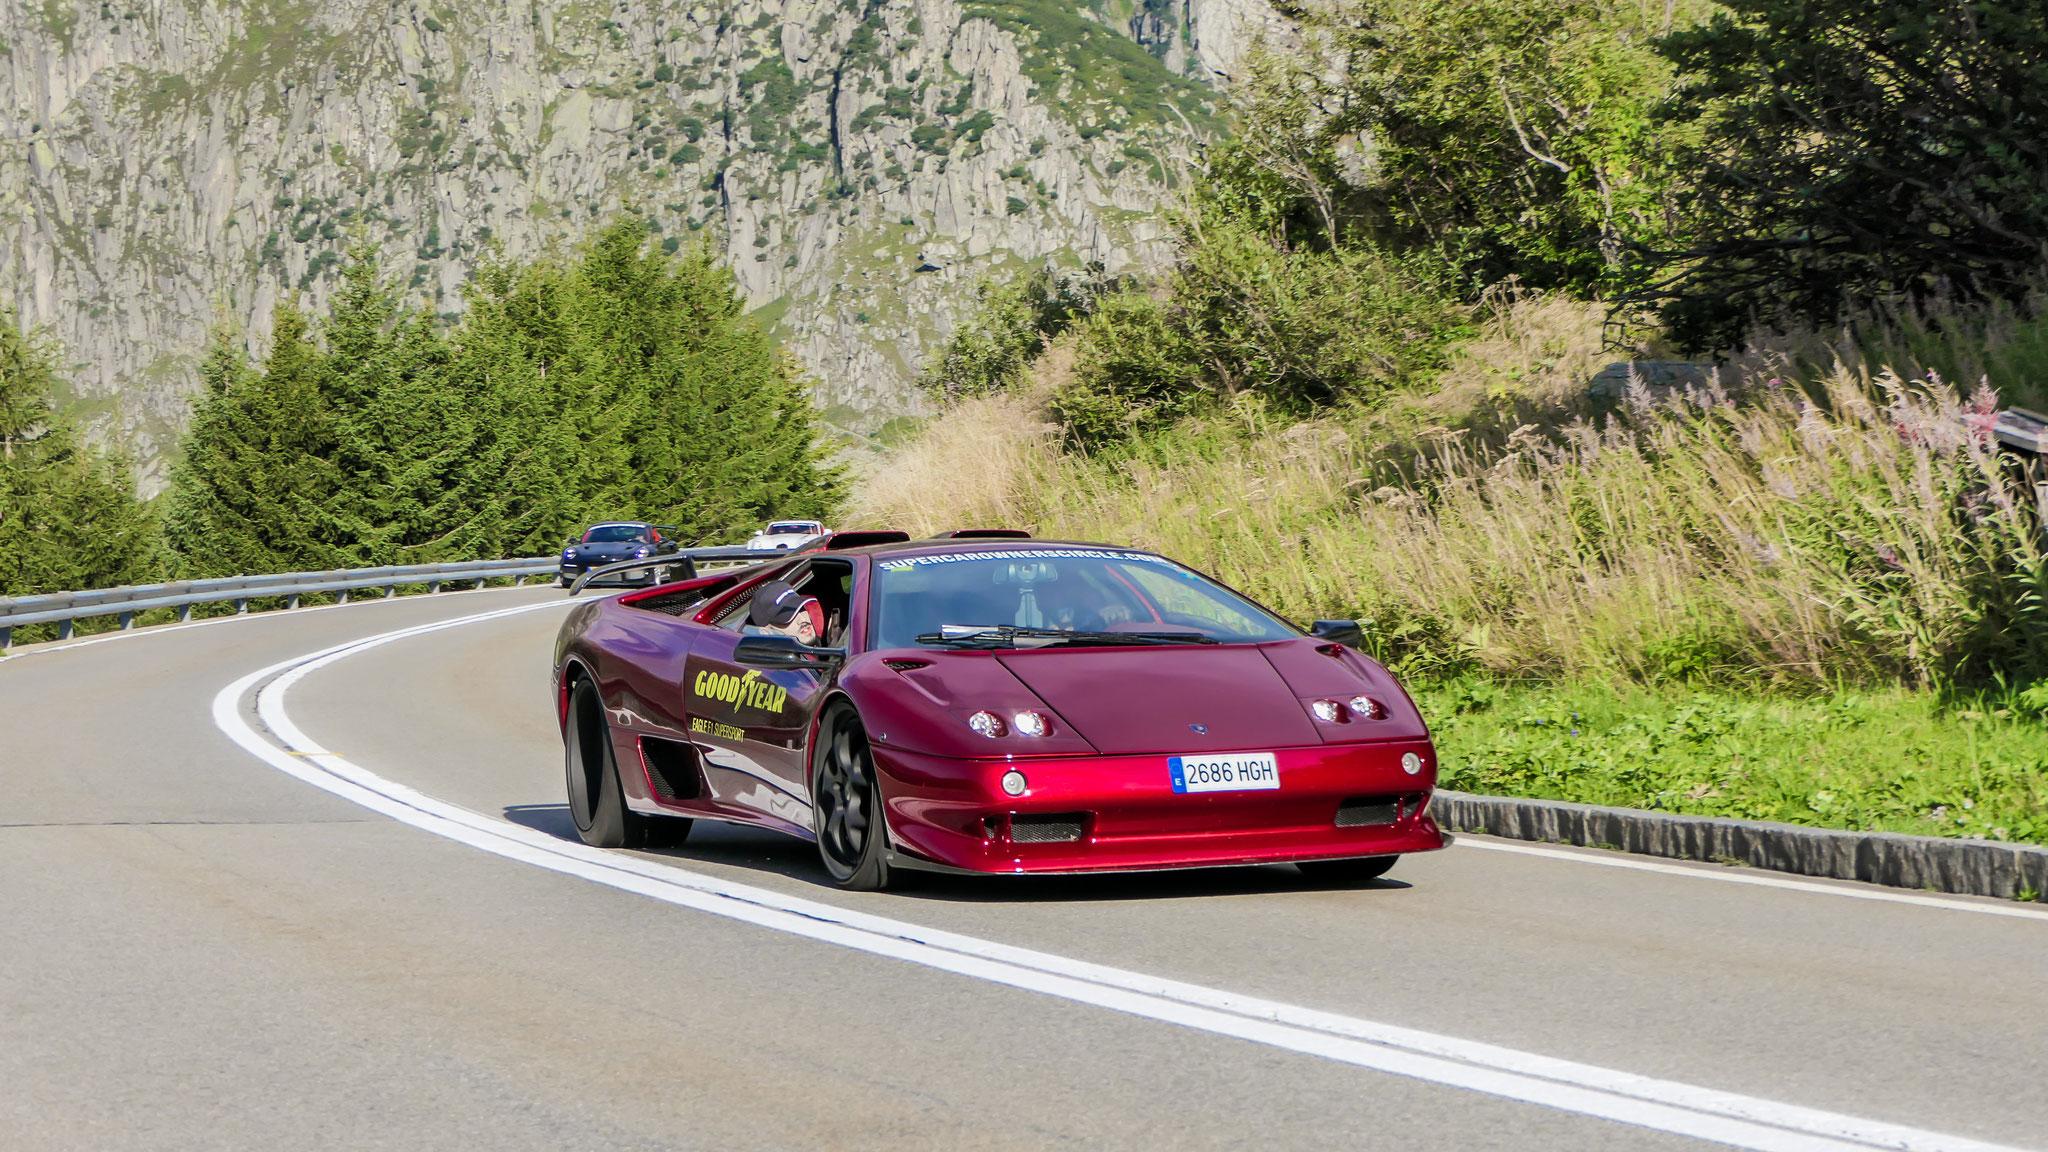 Lamborghini Diablo - 2686-HGH (ESP)